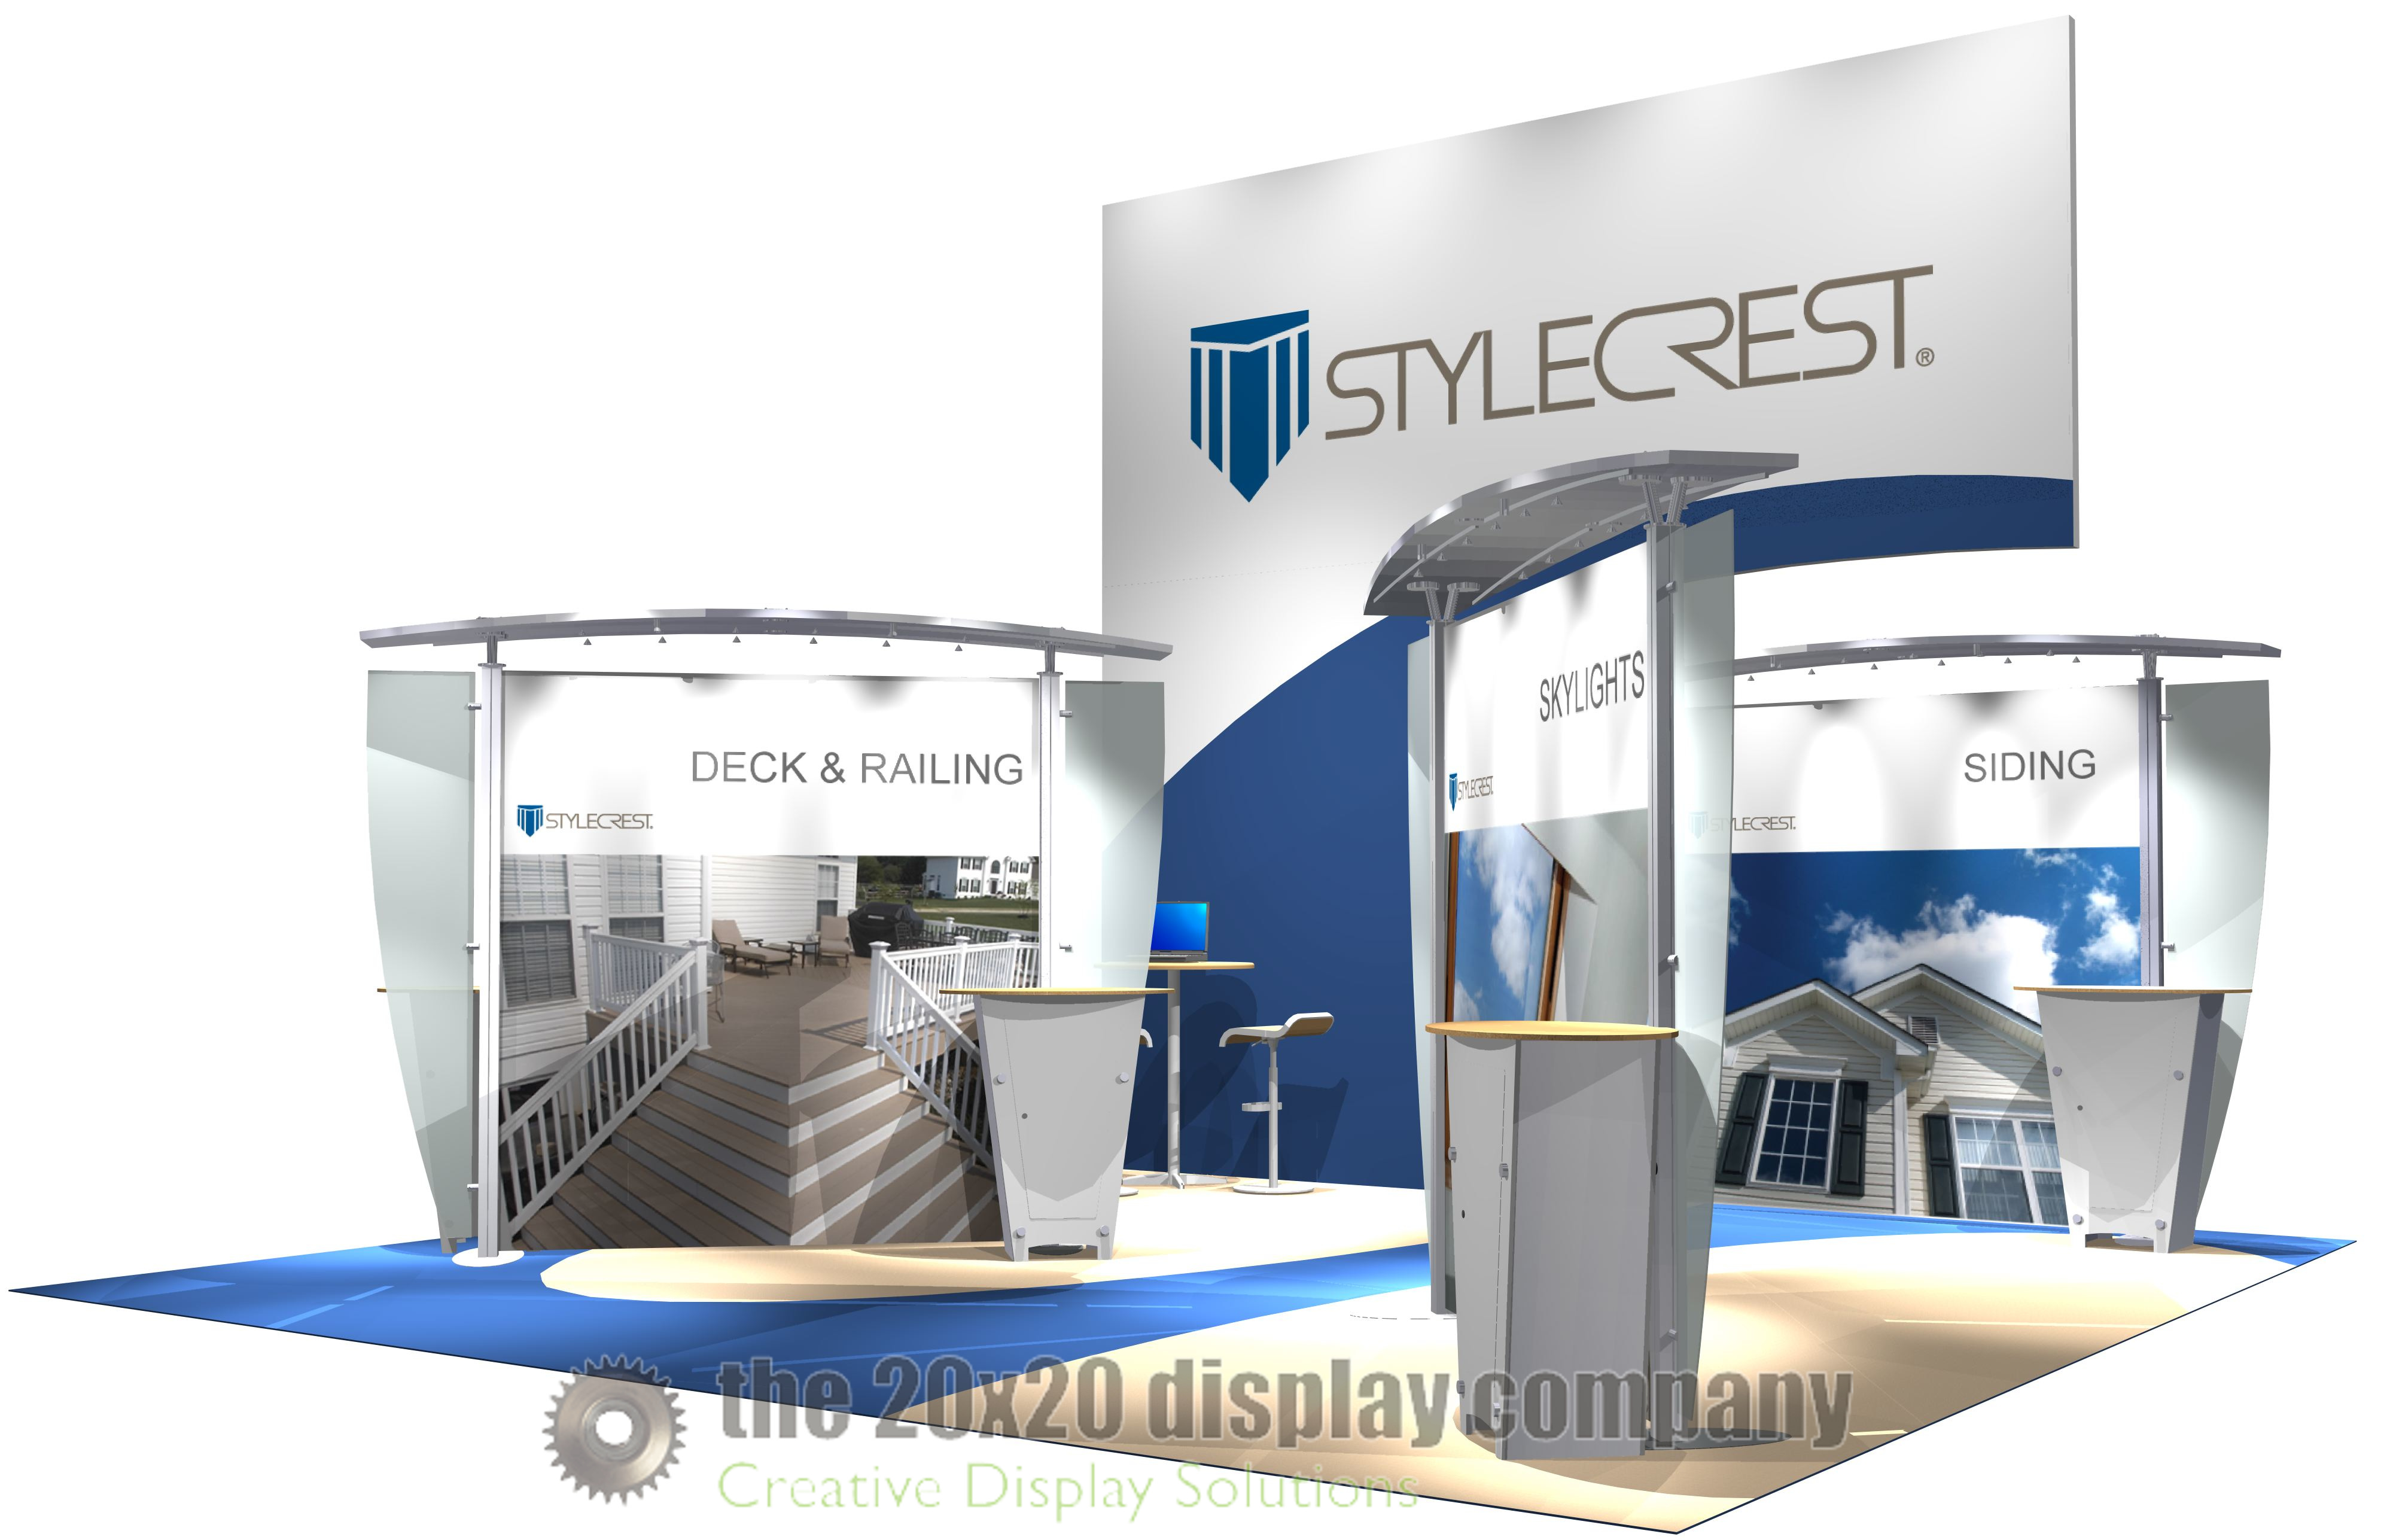 Stylecrest 20x20 Display